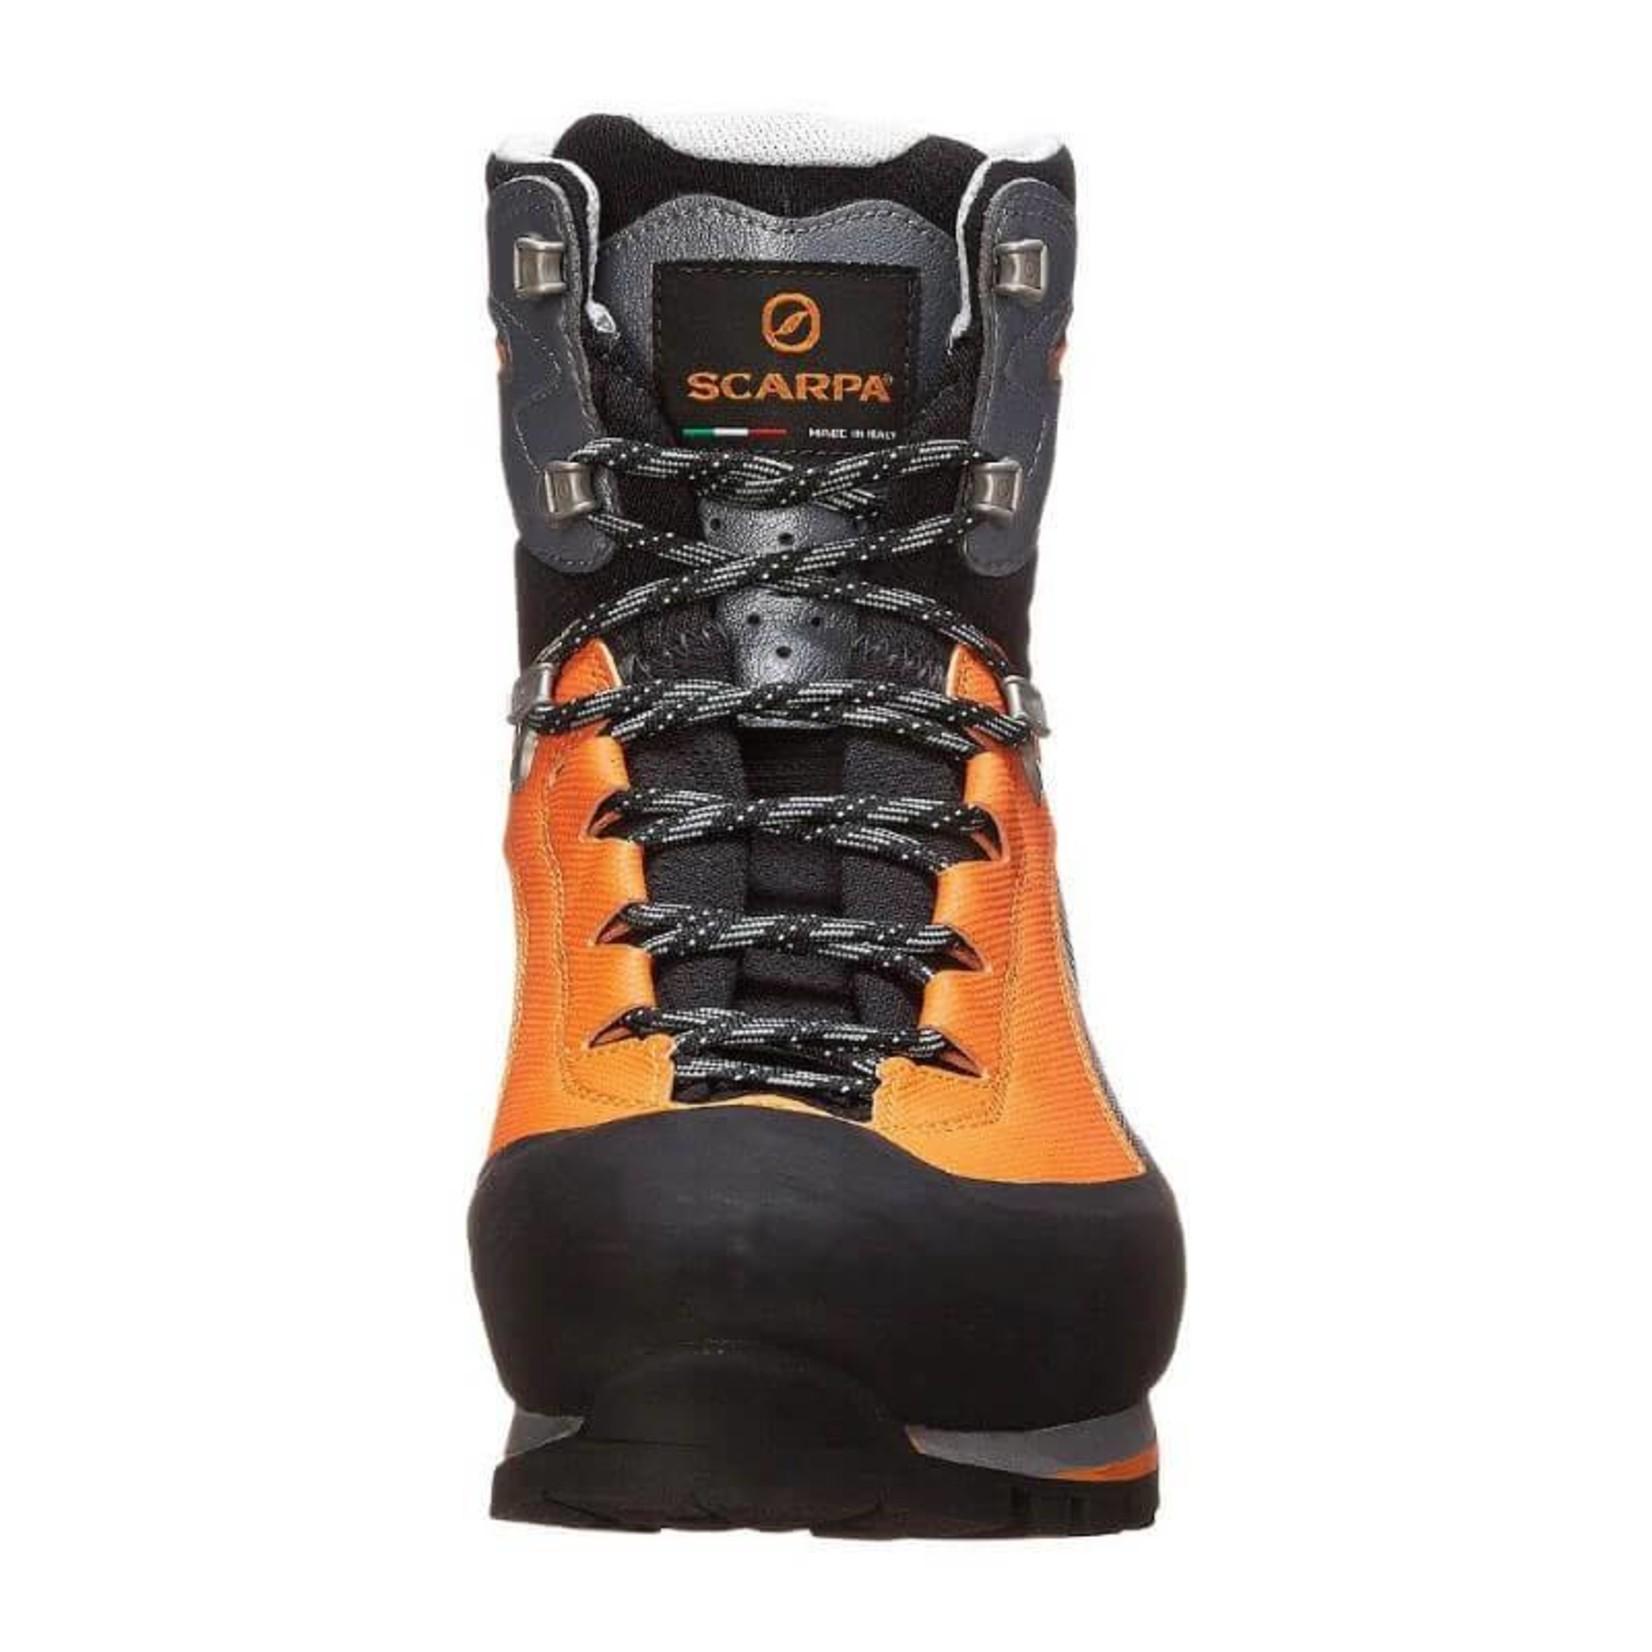 Scarpa Scarpa Charmoz Mountaineering Boots - Men